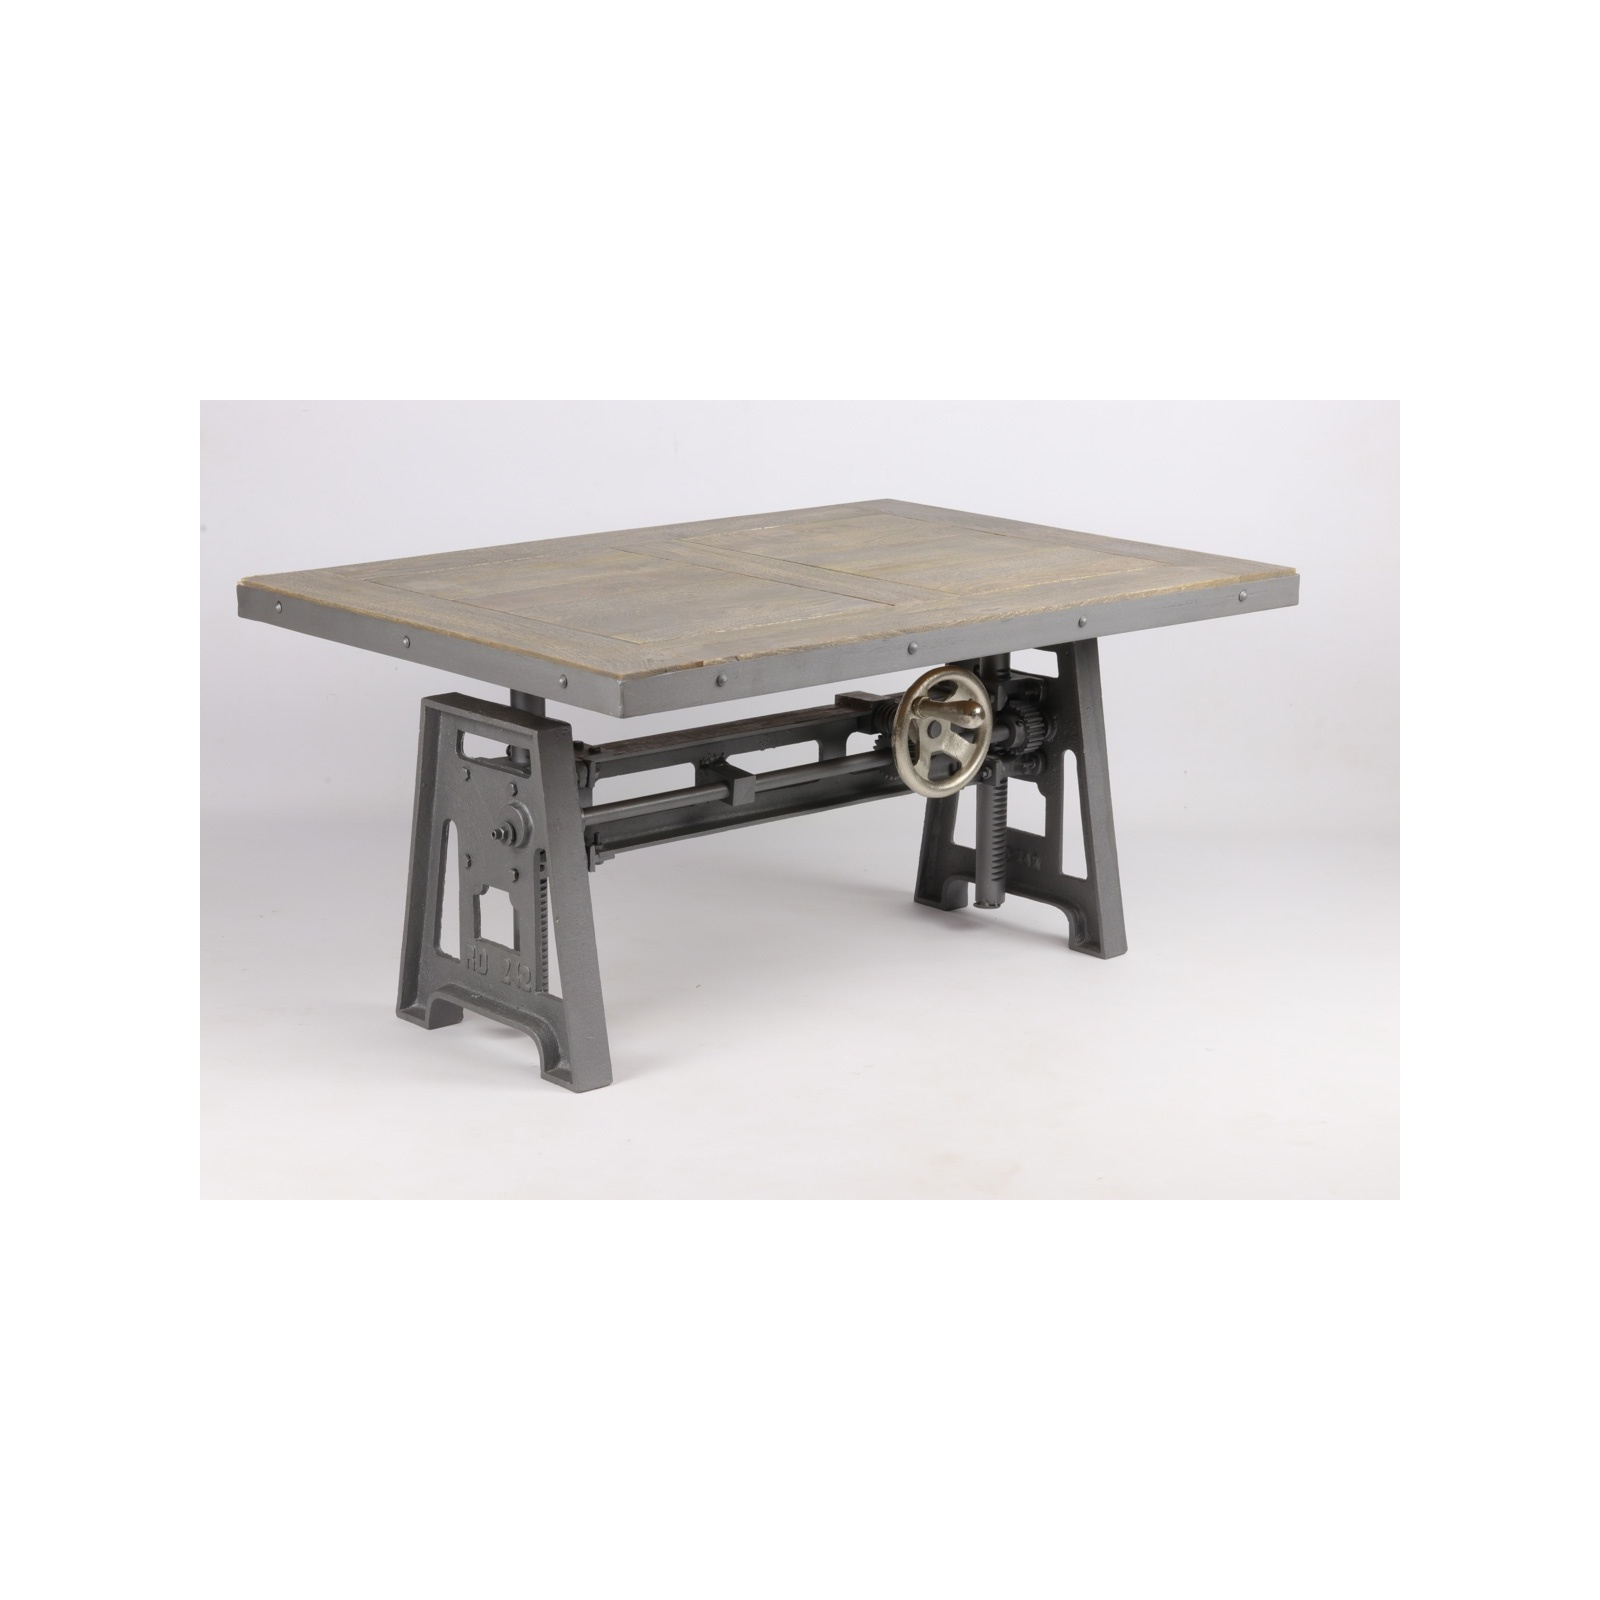 petite table basse industrielle manivelle jp2b d coration. Black Bedroom Furniture Sets. Home Design Ideas